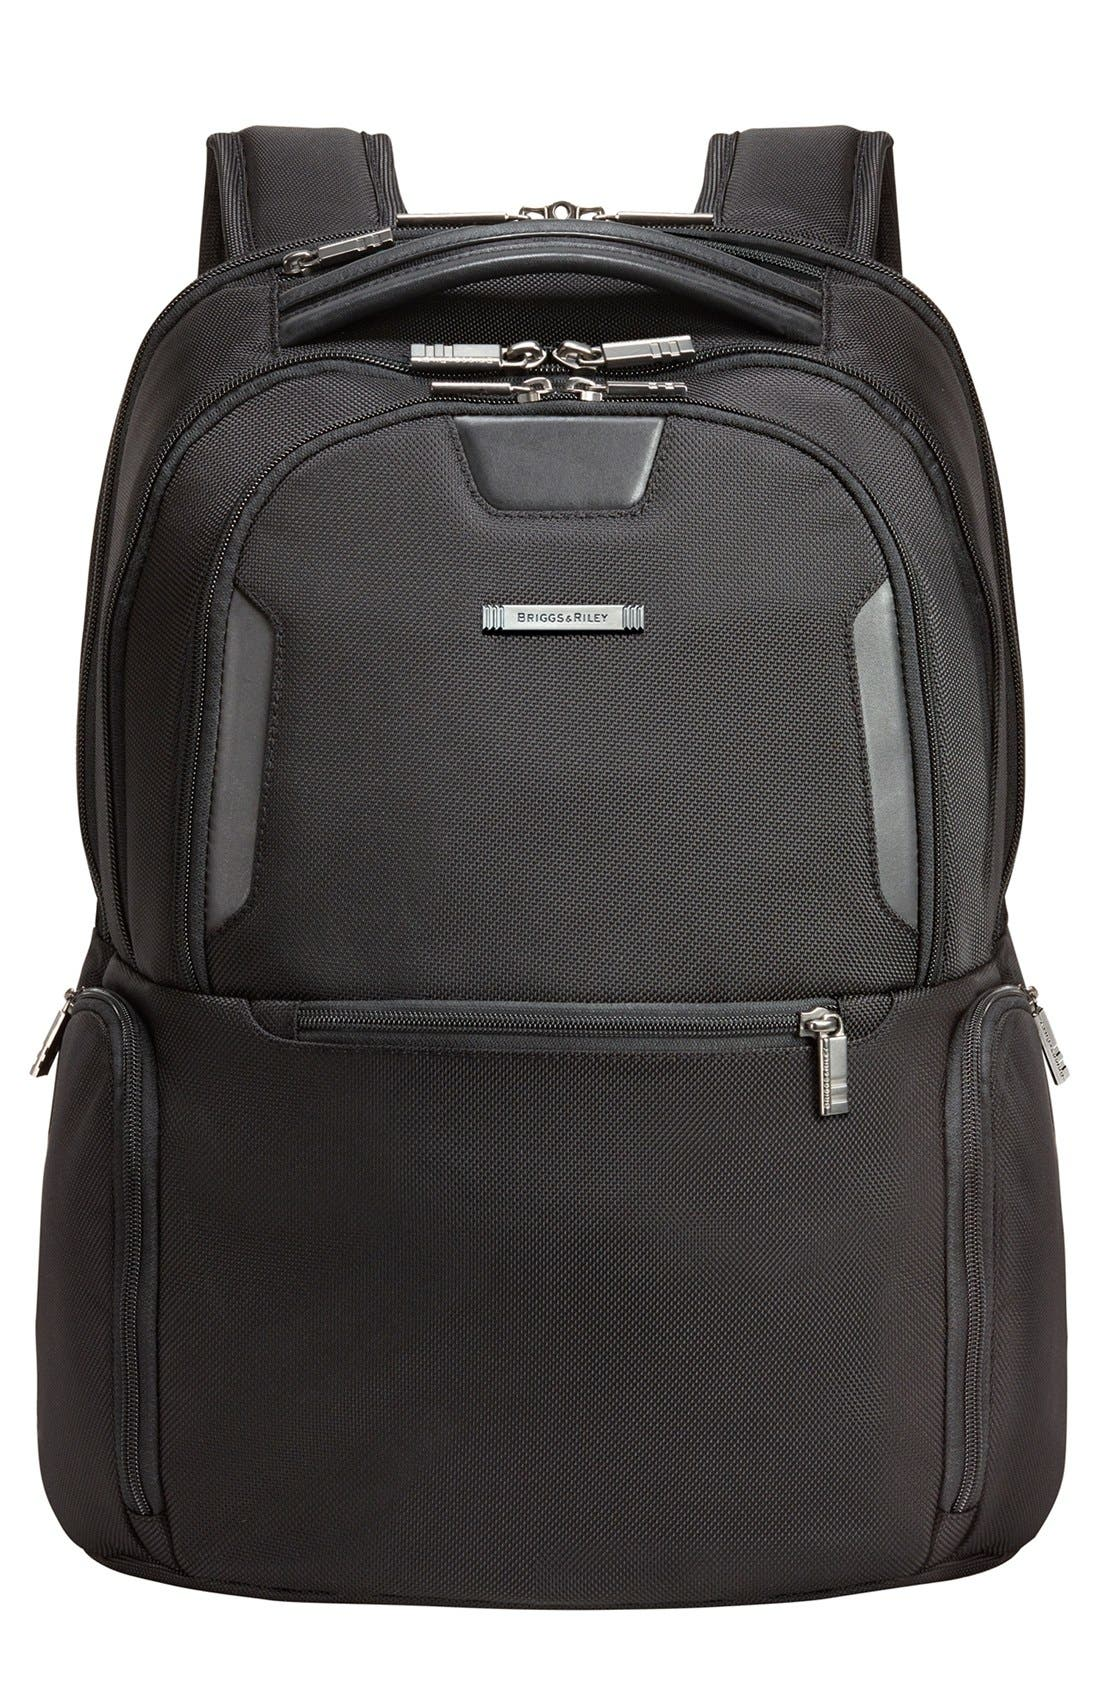 Main Image - Briggs & Riley '@work - Medium' Backpack